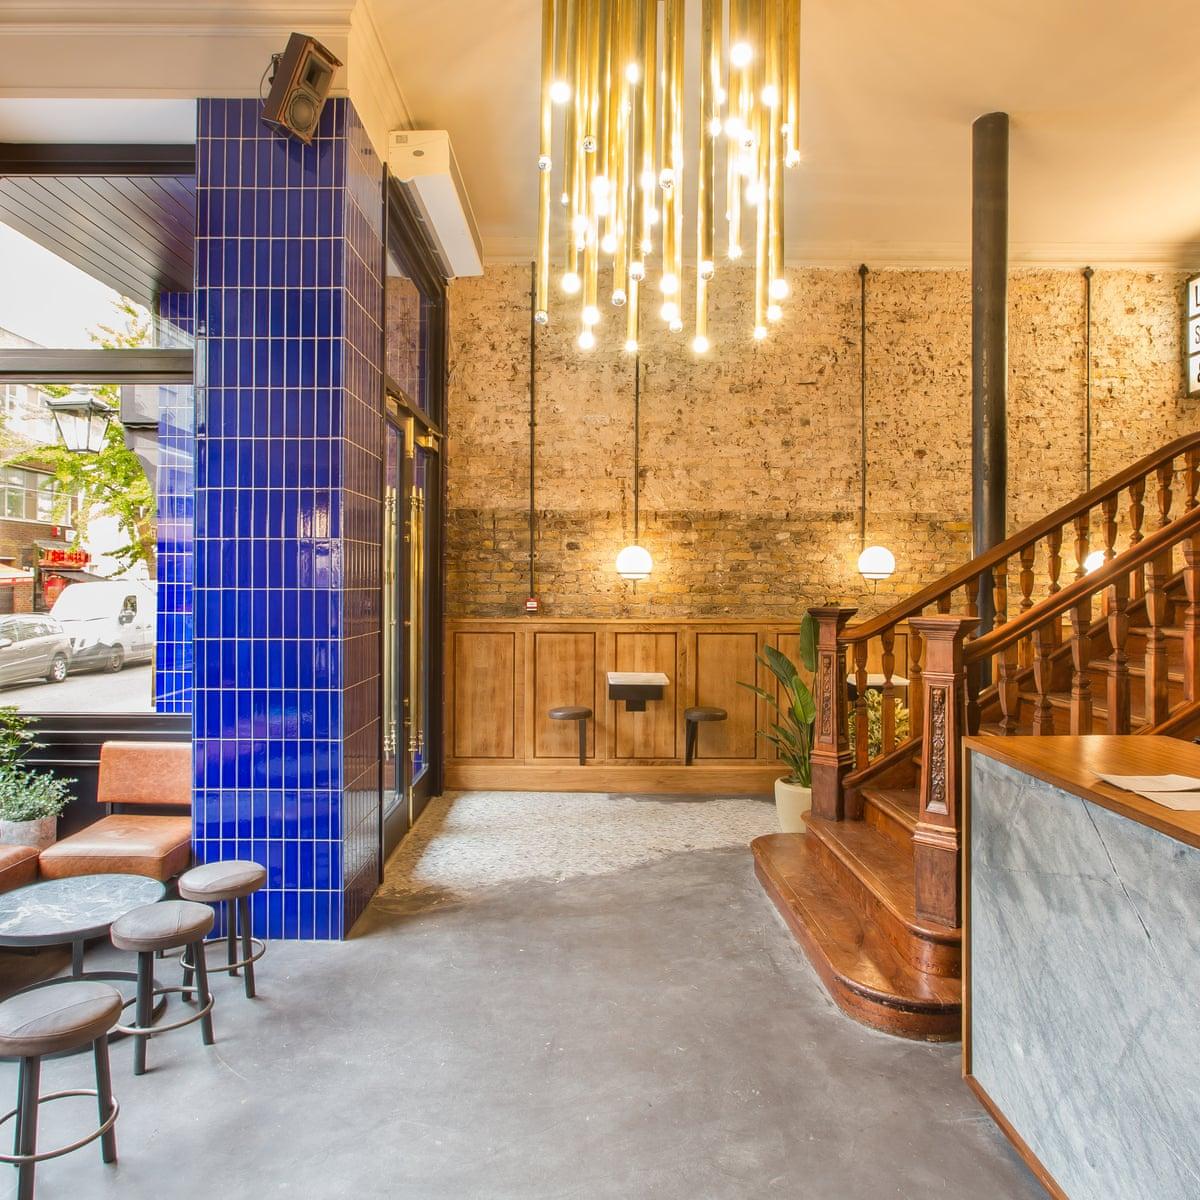 The Pilgrm Paddington London Hotel Review London Holidays The Guardian